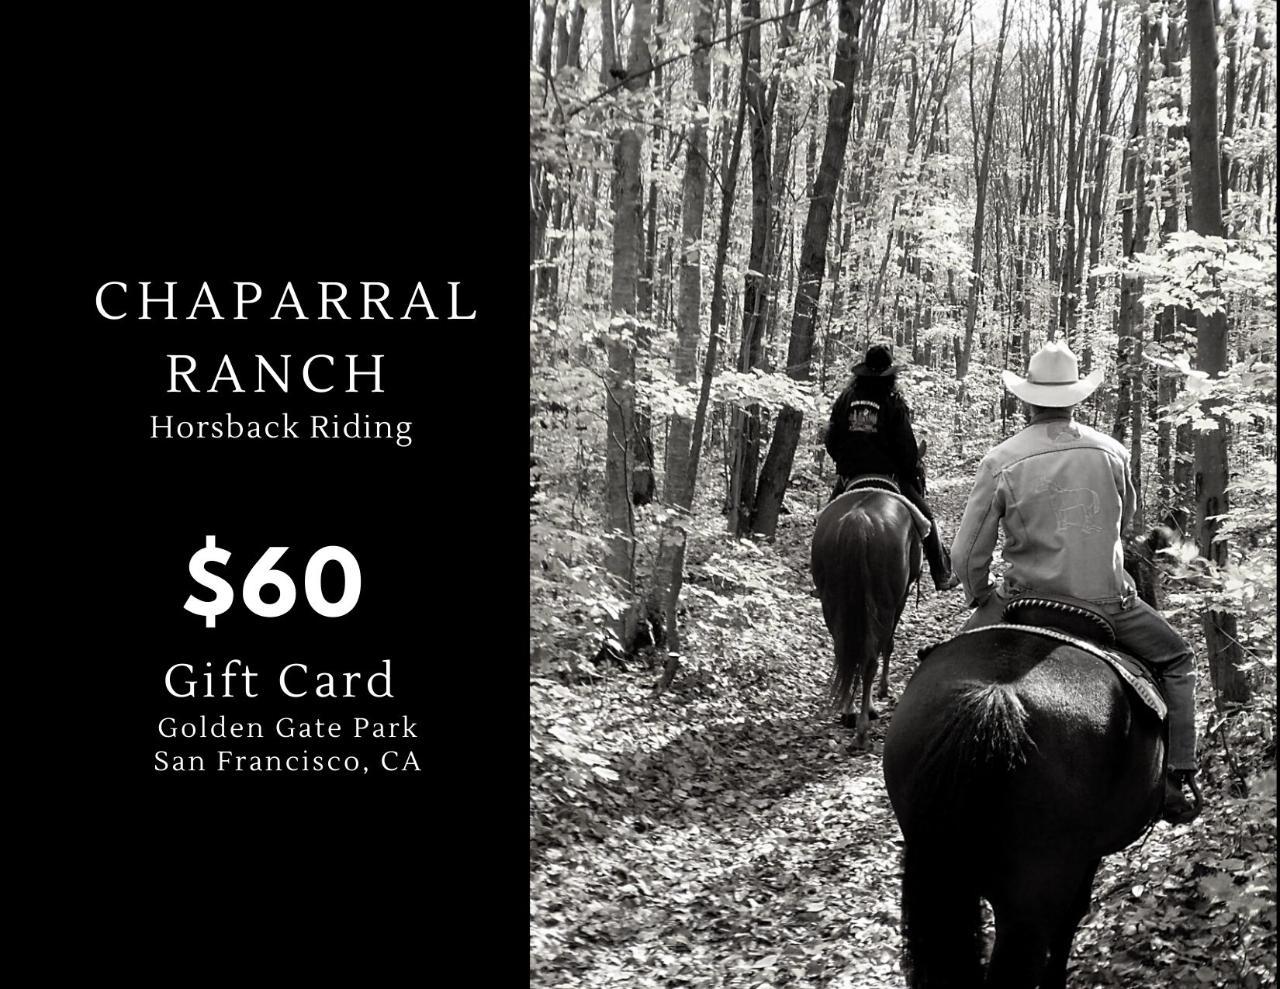 $60 Gift Card Golden Gate Park